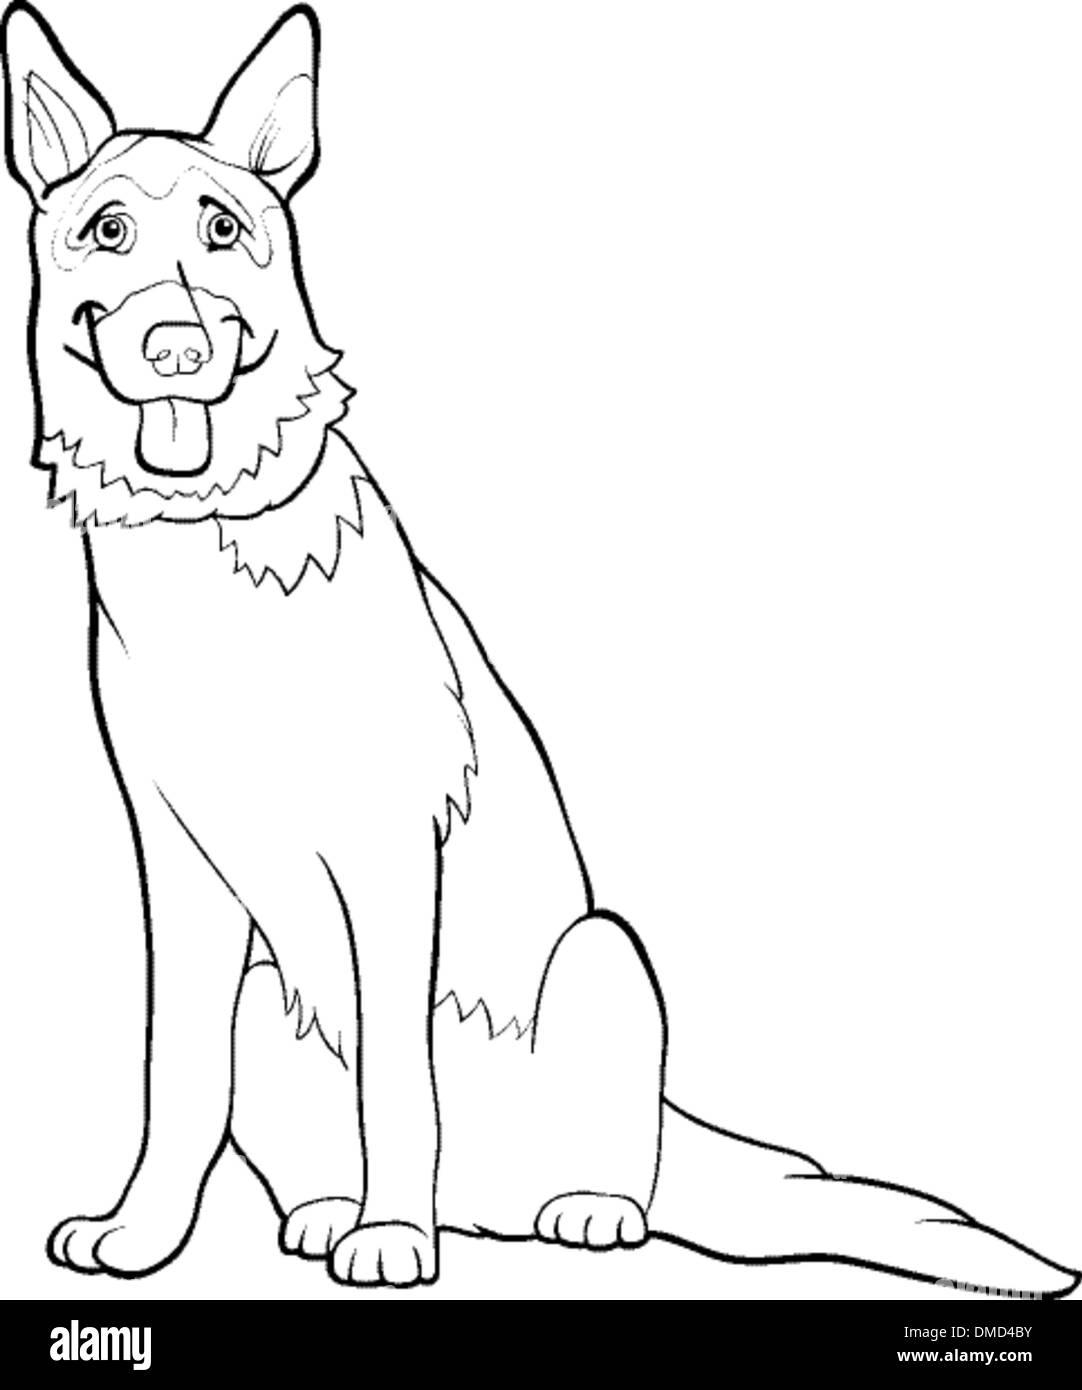 german shepherd dog cartoon for coloring - Stock Vector